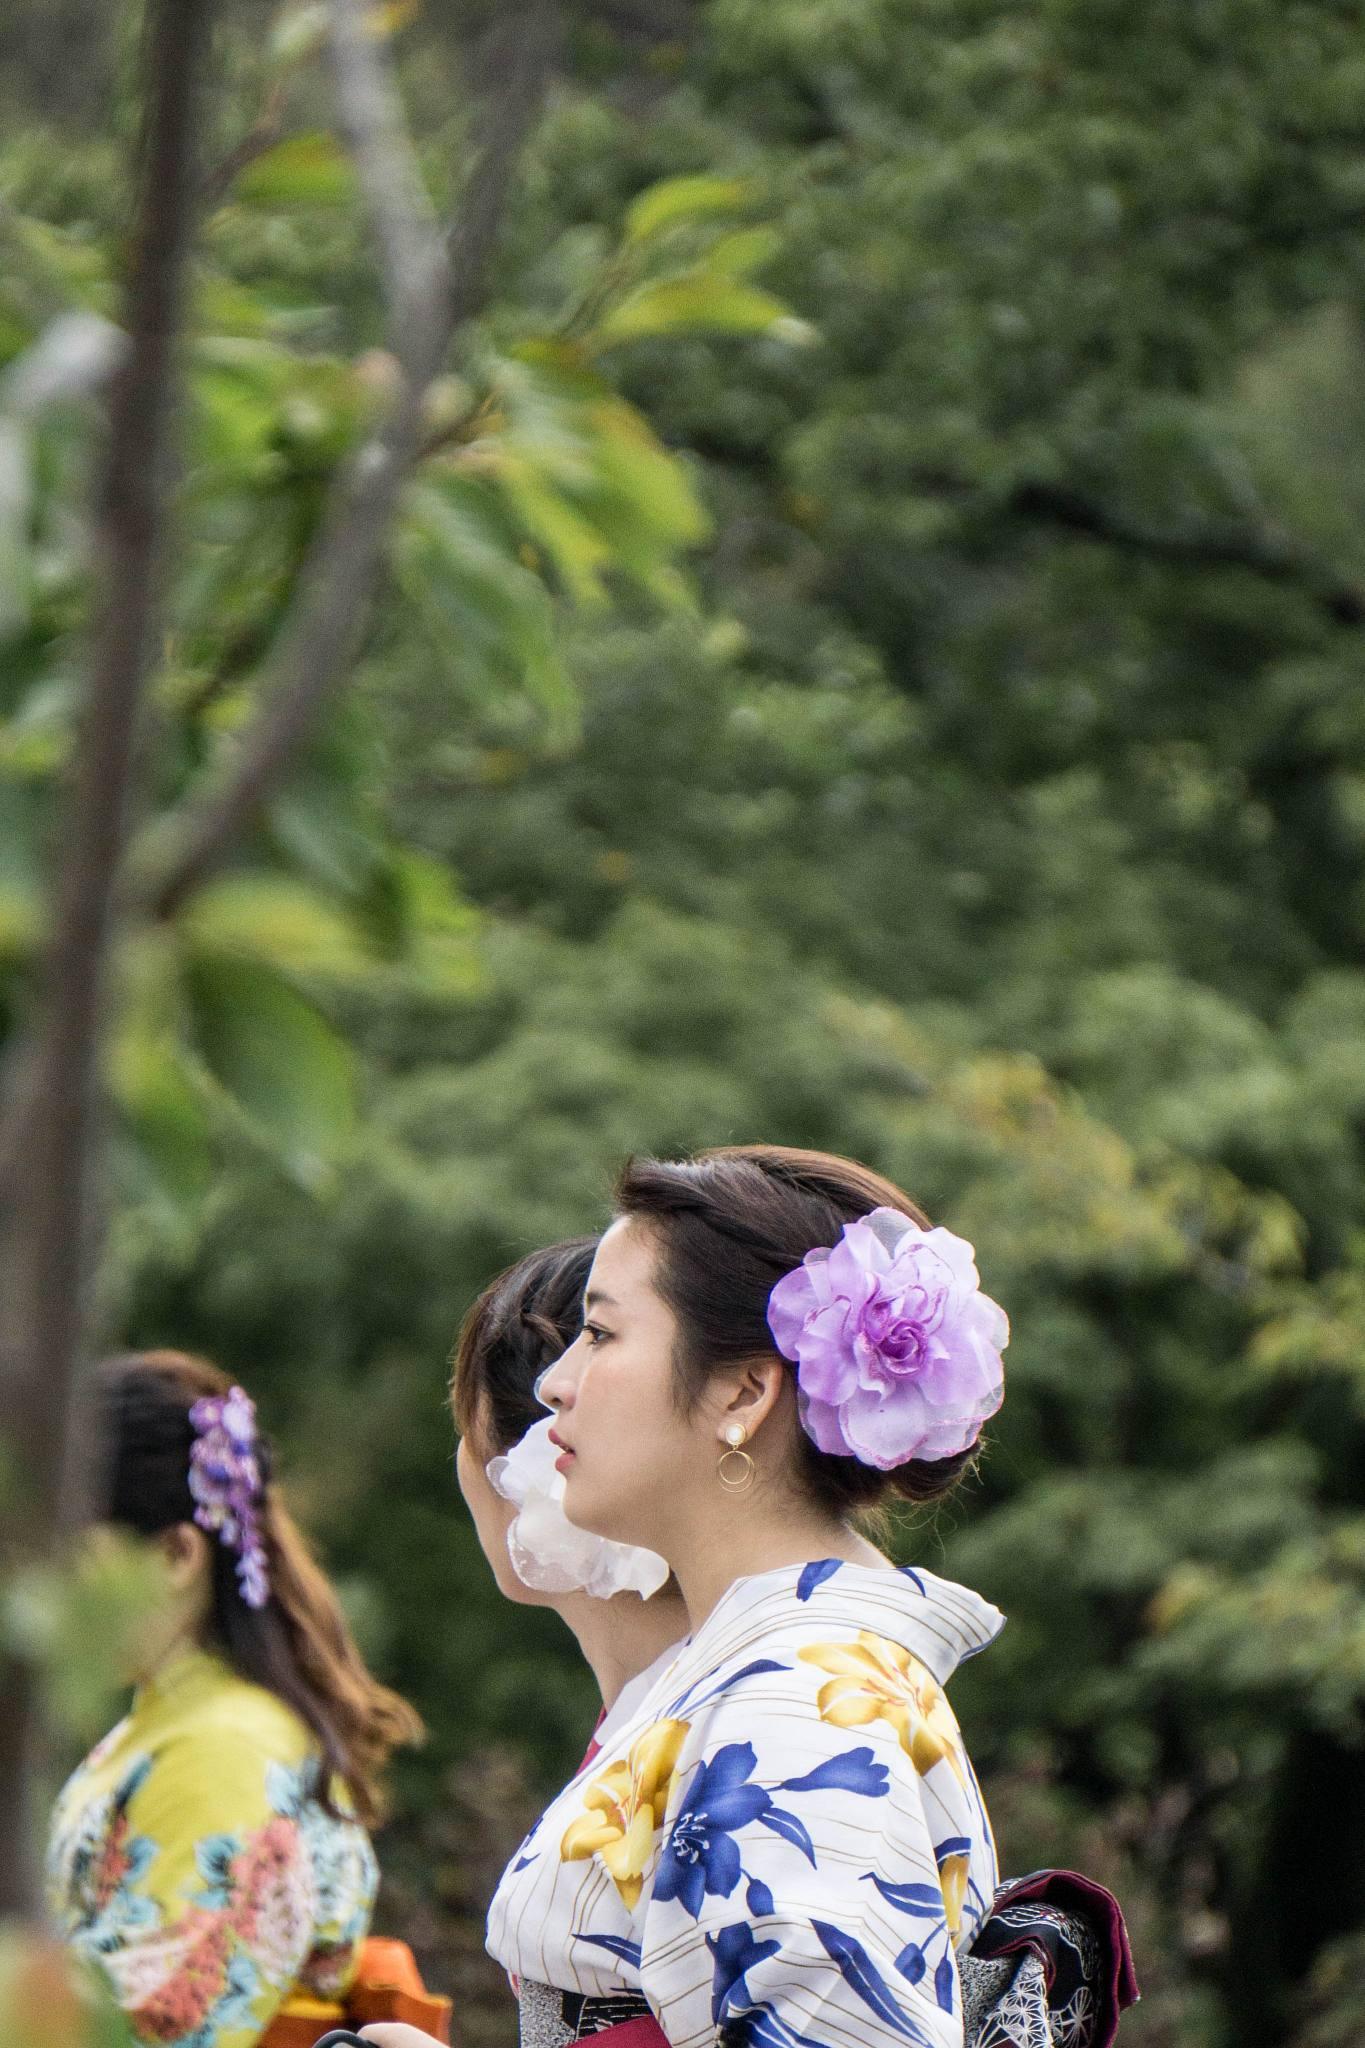 Femmes en tenue traditionnelle, temple Kiyomizu-dera